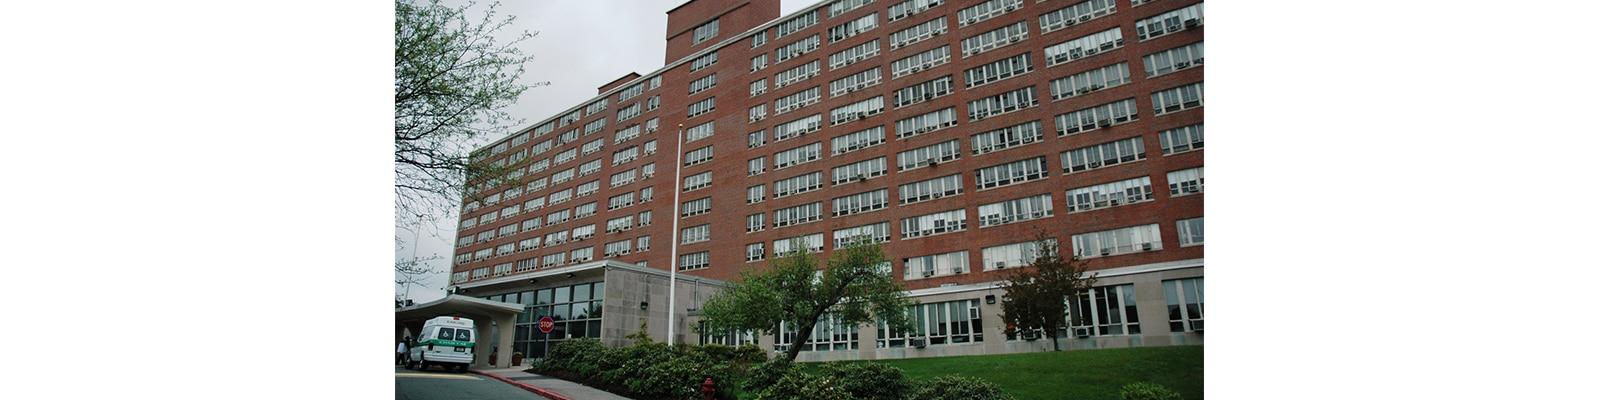 Lemuel Shattuck Hospital Correctional Unit